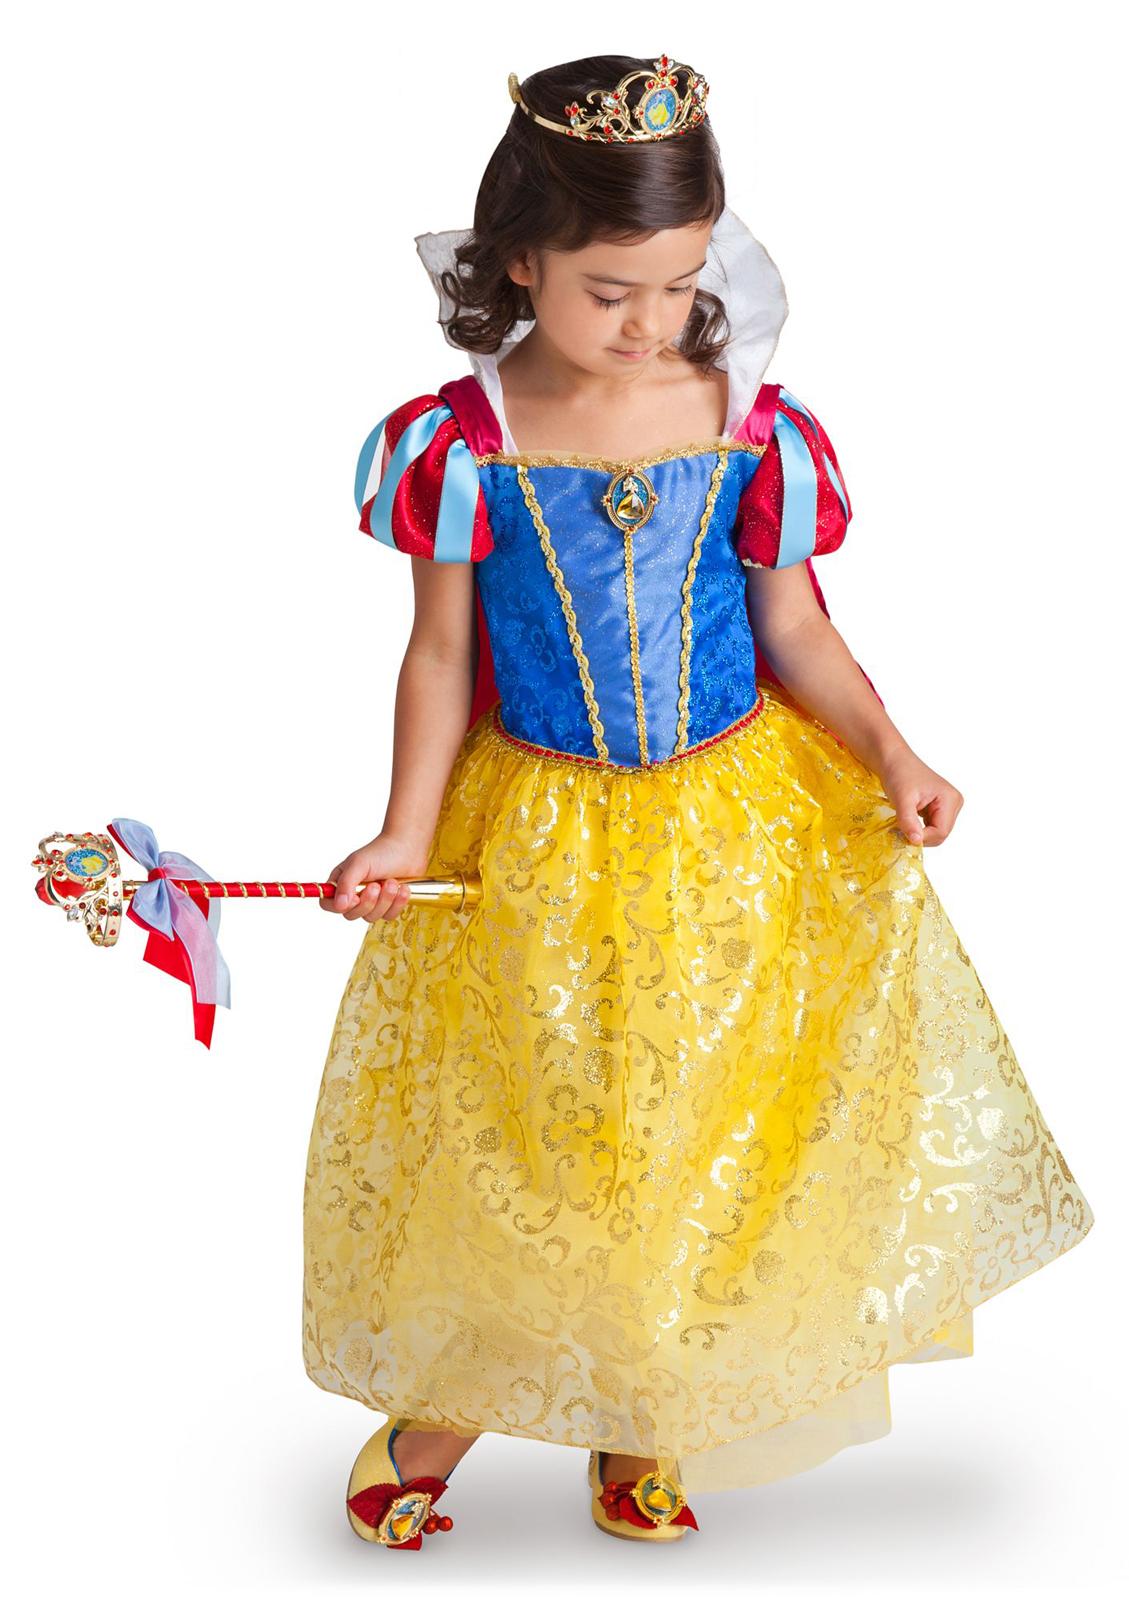 Filmic Light - Snow White Archive: Snow White Halloween Costumes ...